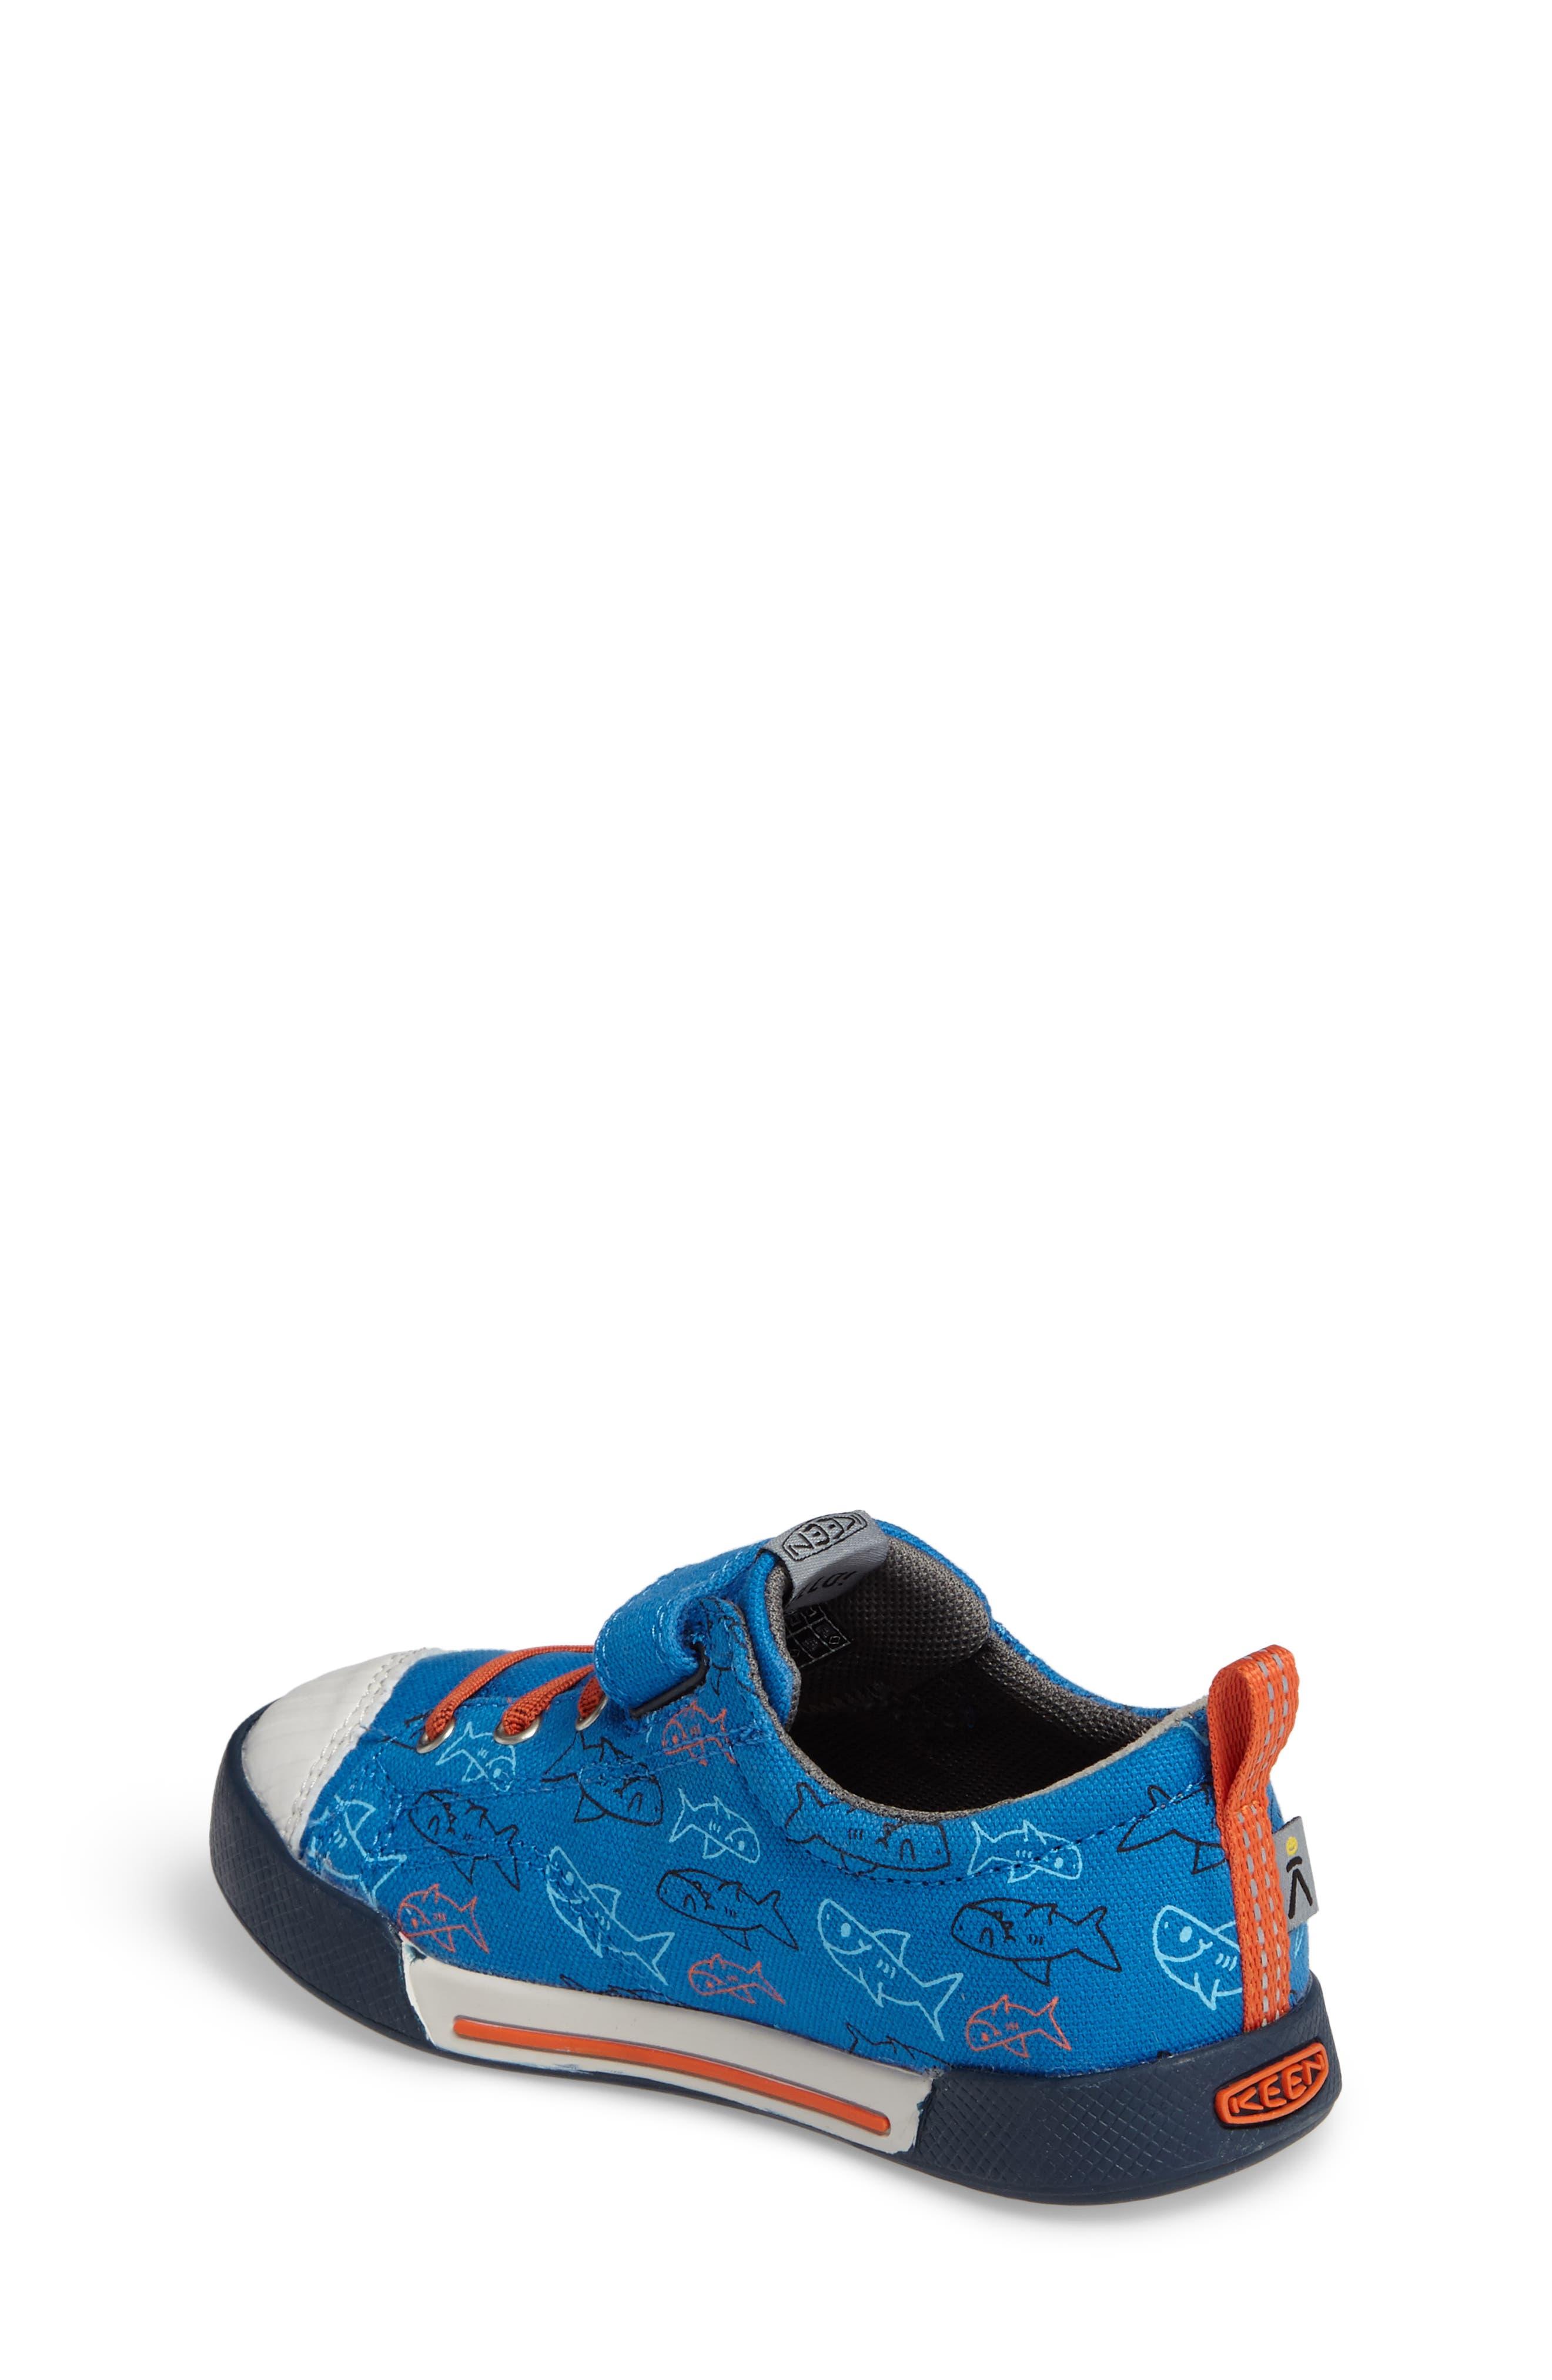 Encanto Finley Sneaker,                             Alternate thumbnail 2, color,                             402